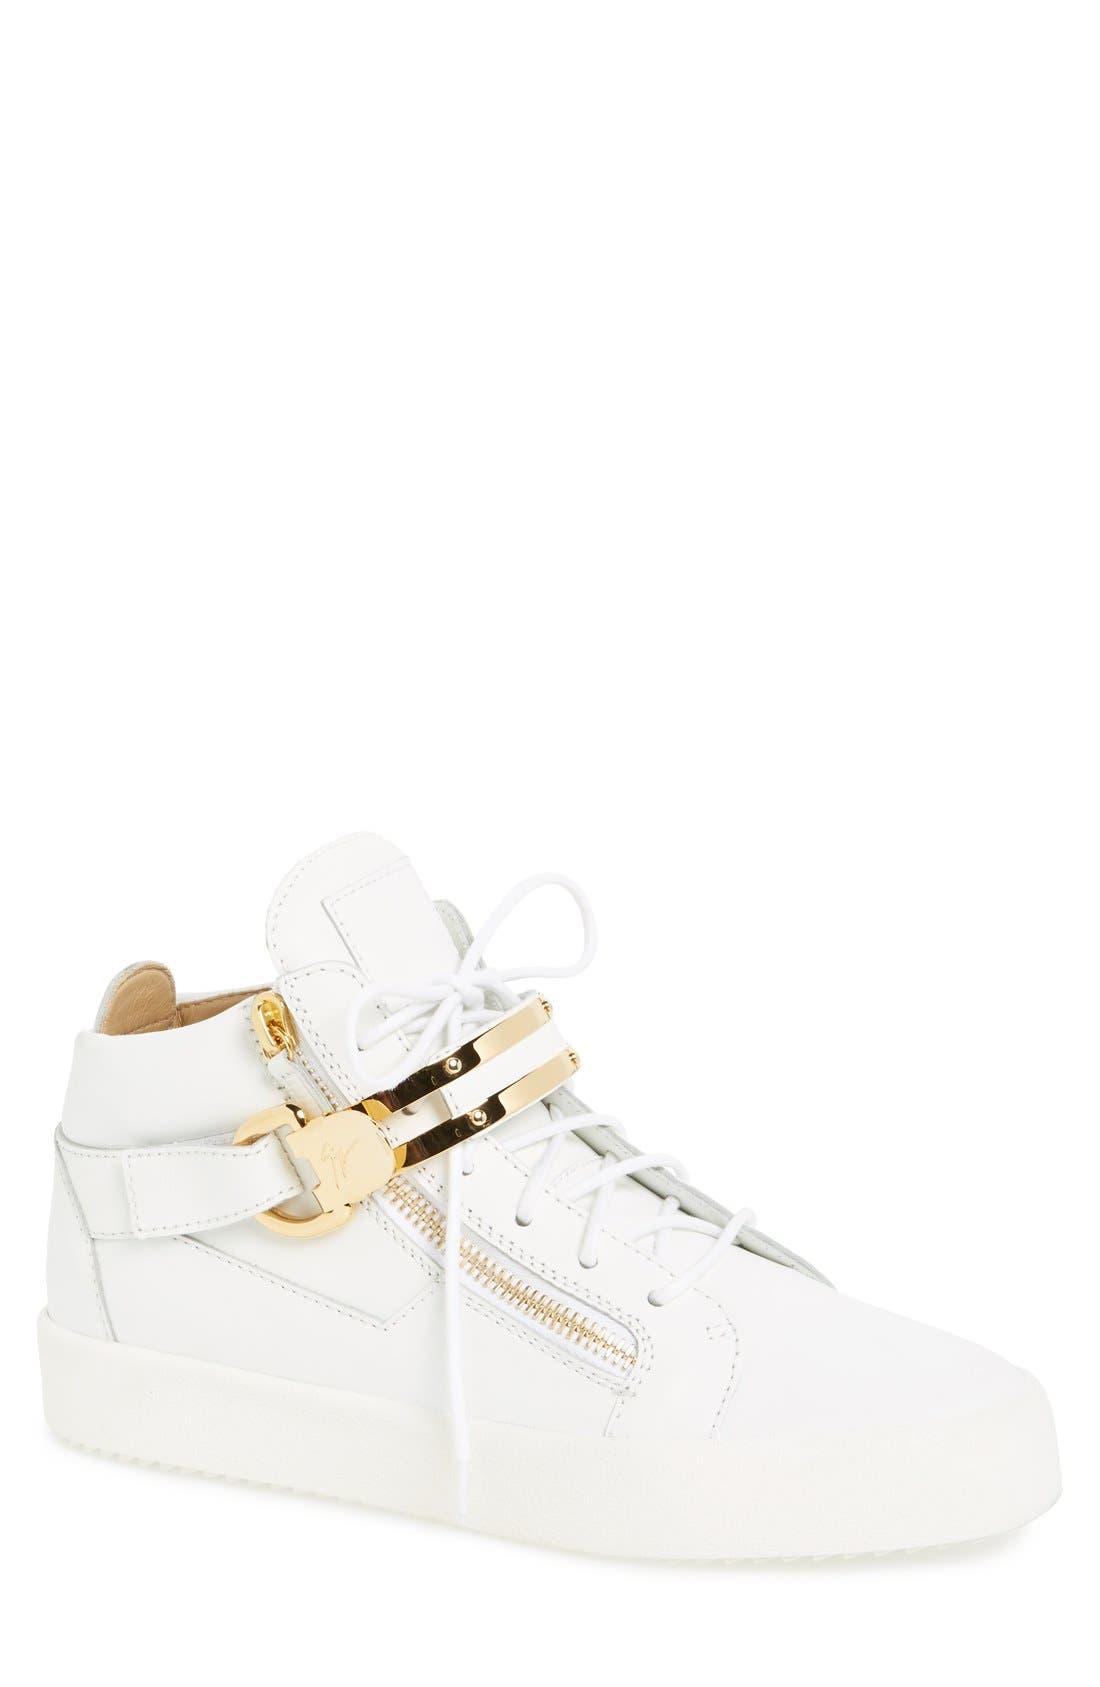 GIUSEPPE ZANOTTI Side Zip High Top Sneaker